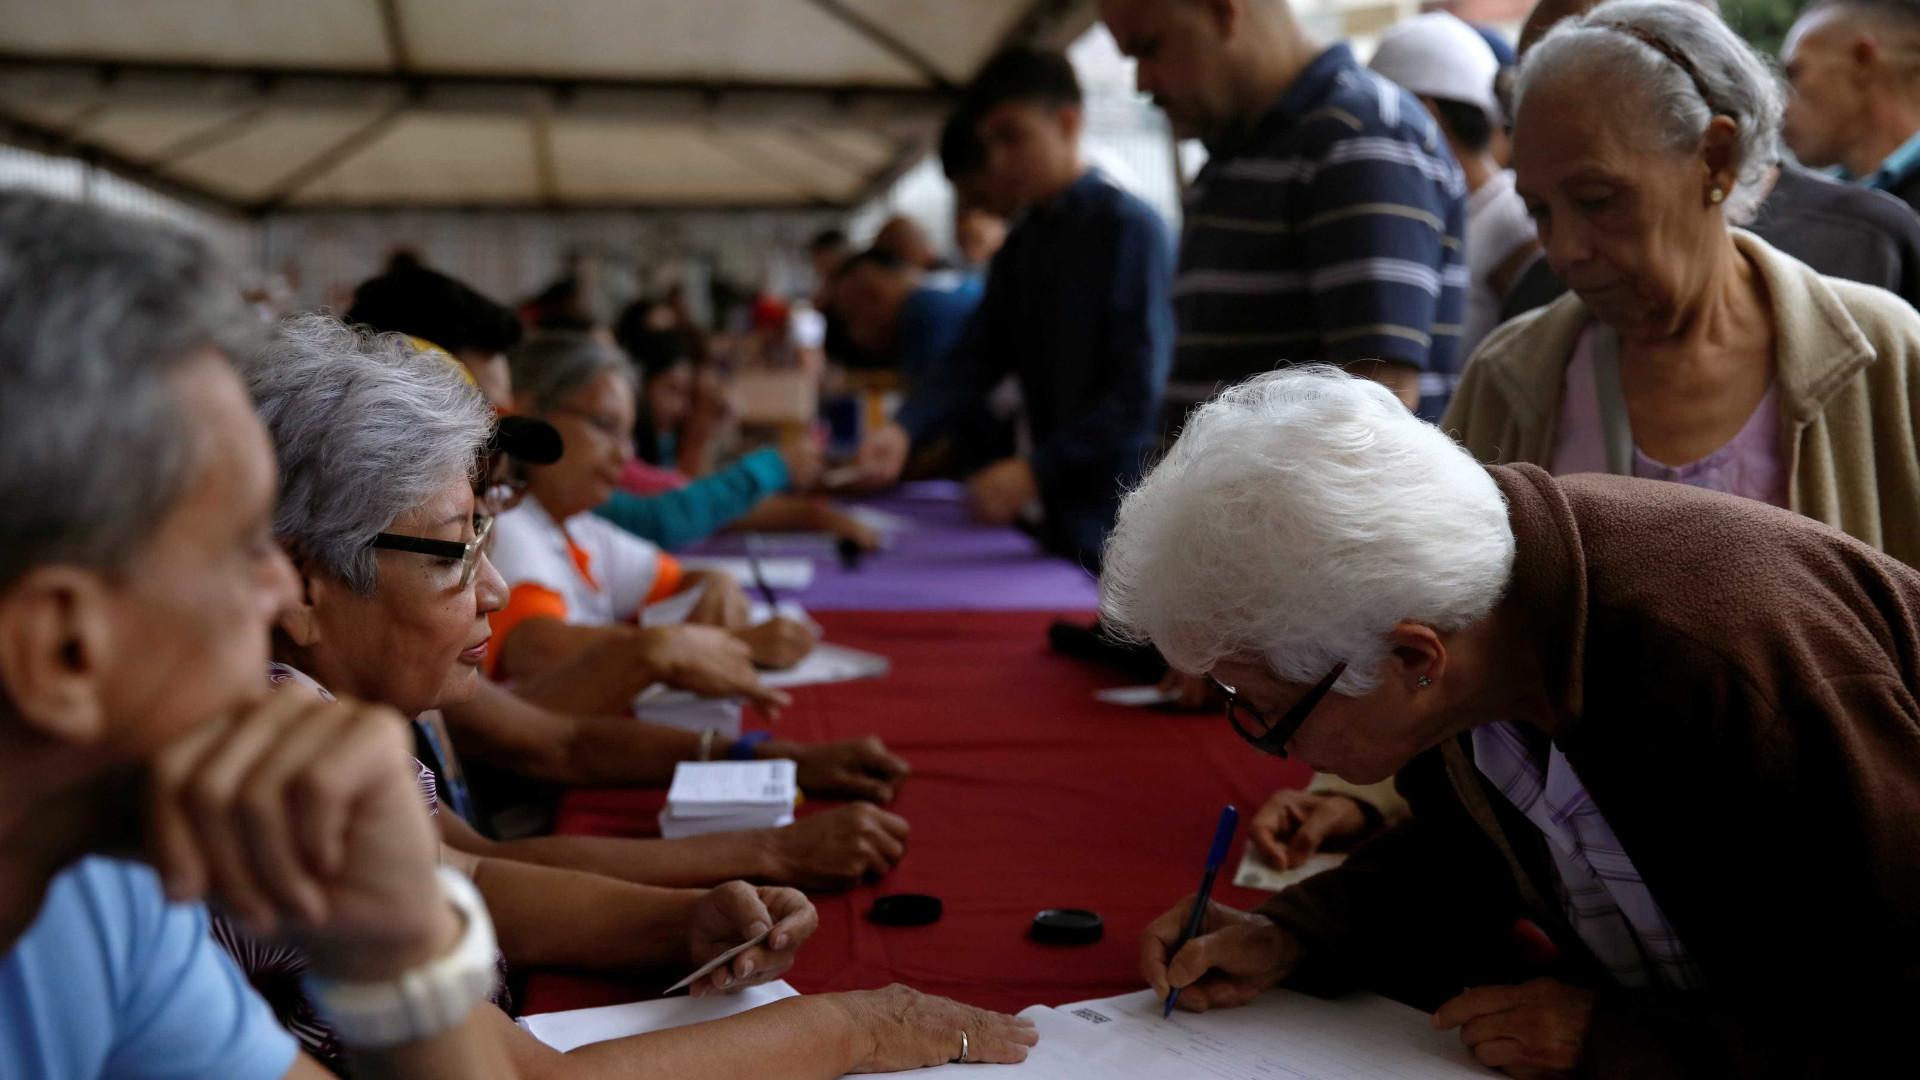 Abertas as urnas para plebiscito simbólico contra Nicolás Maduro